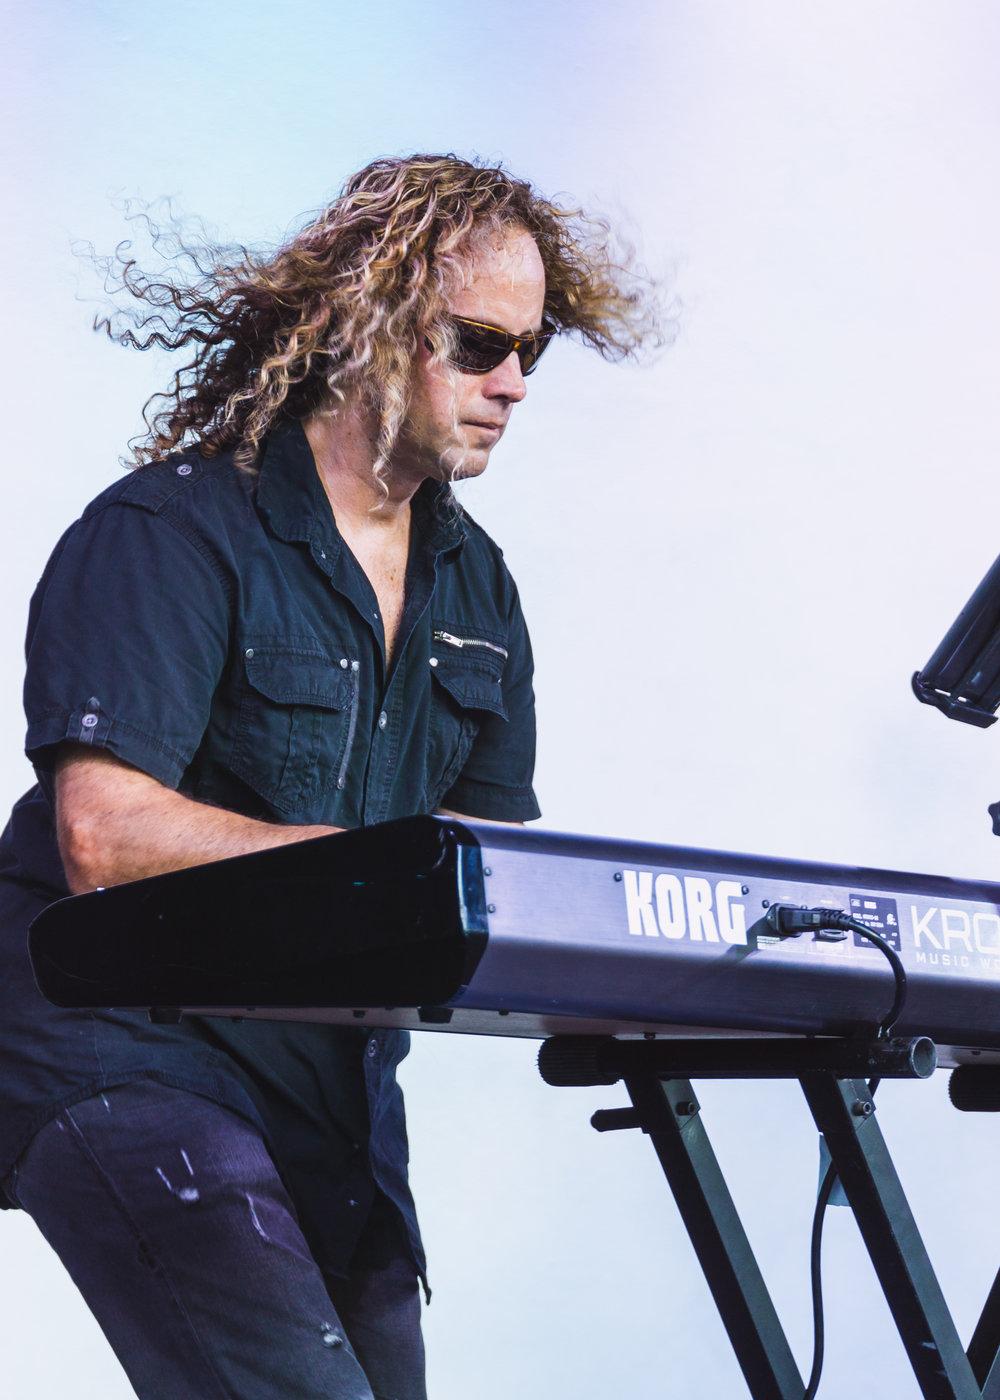 Cary Keyz - Keyboards